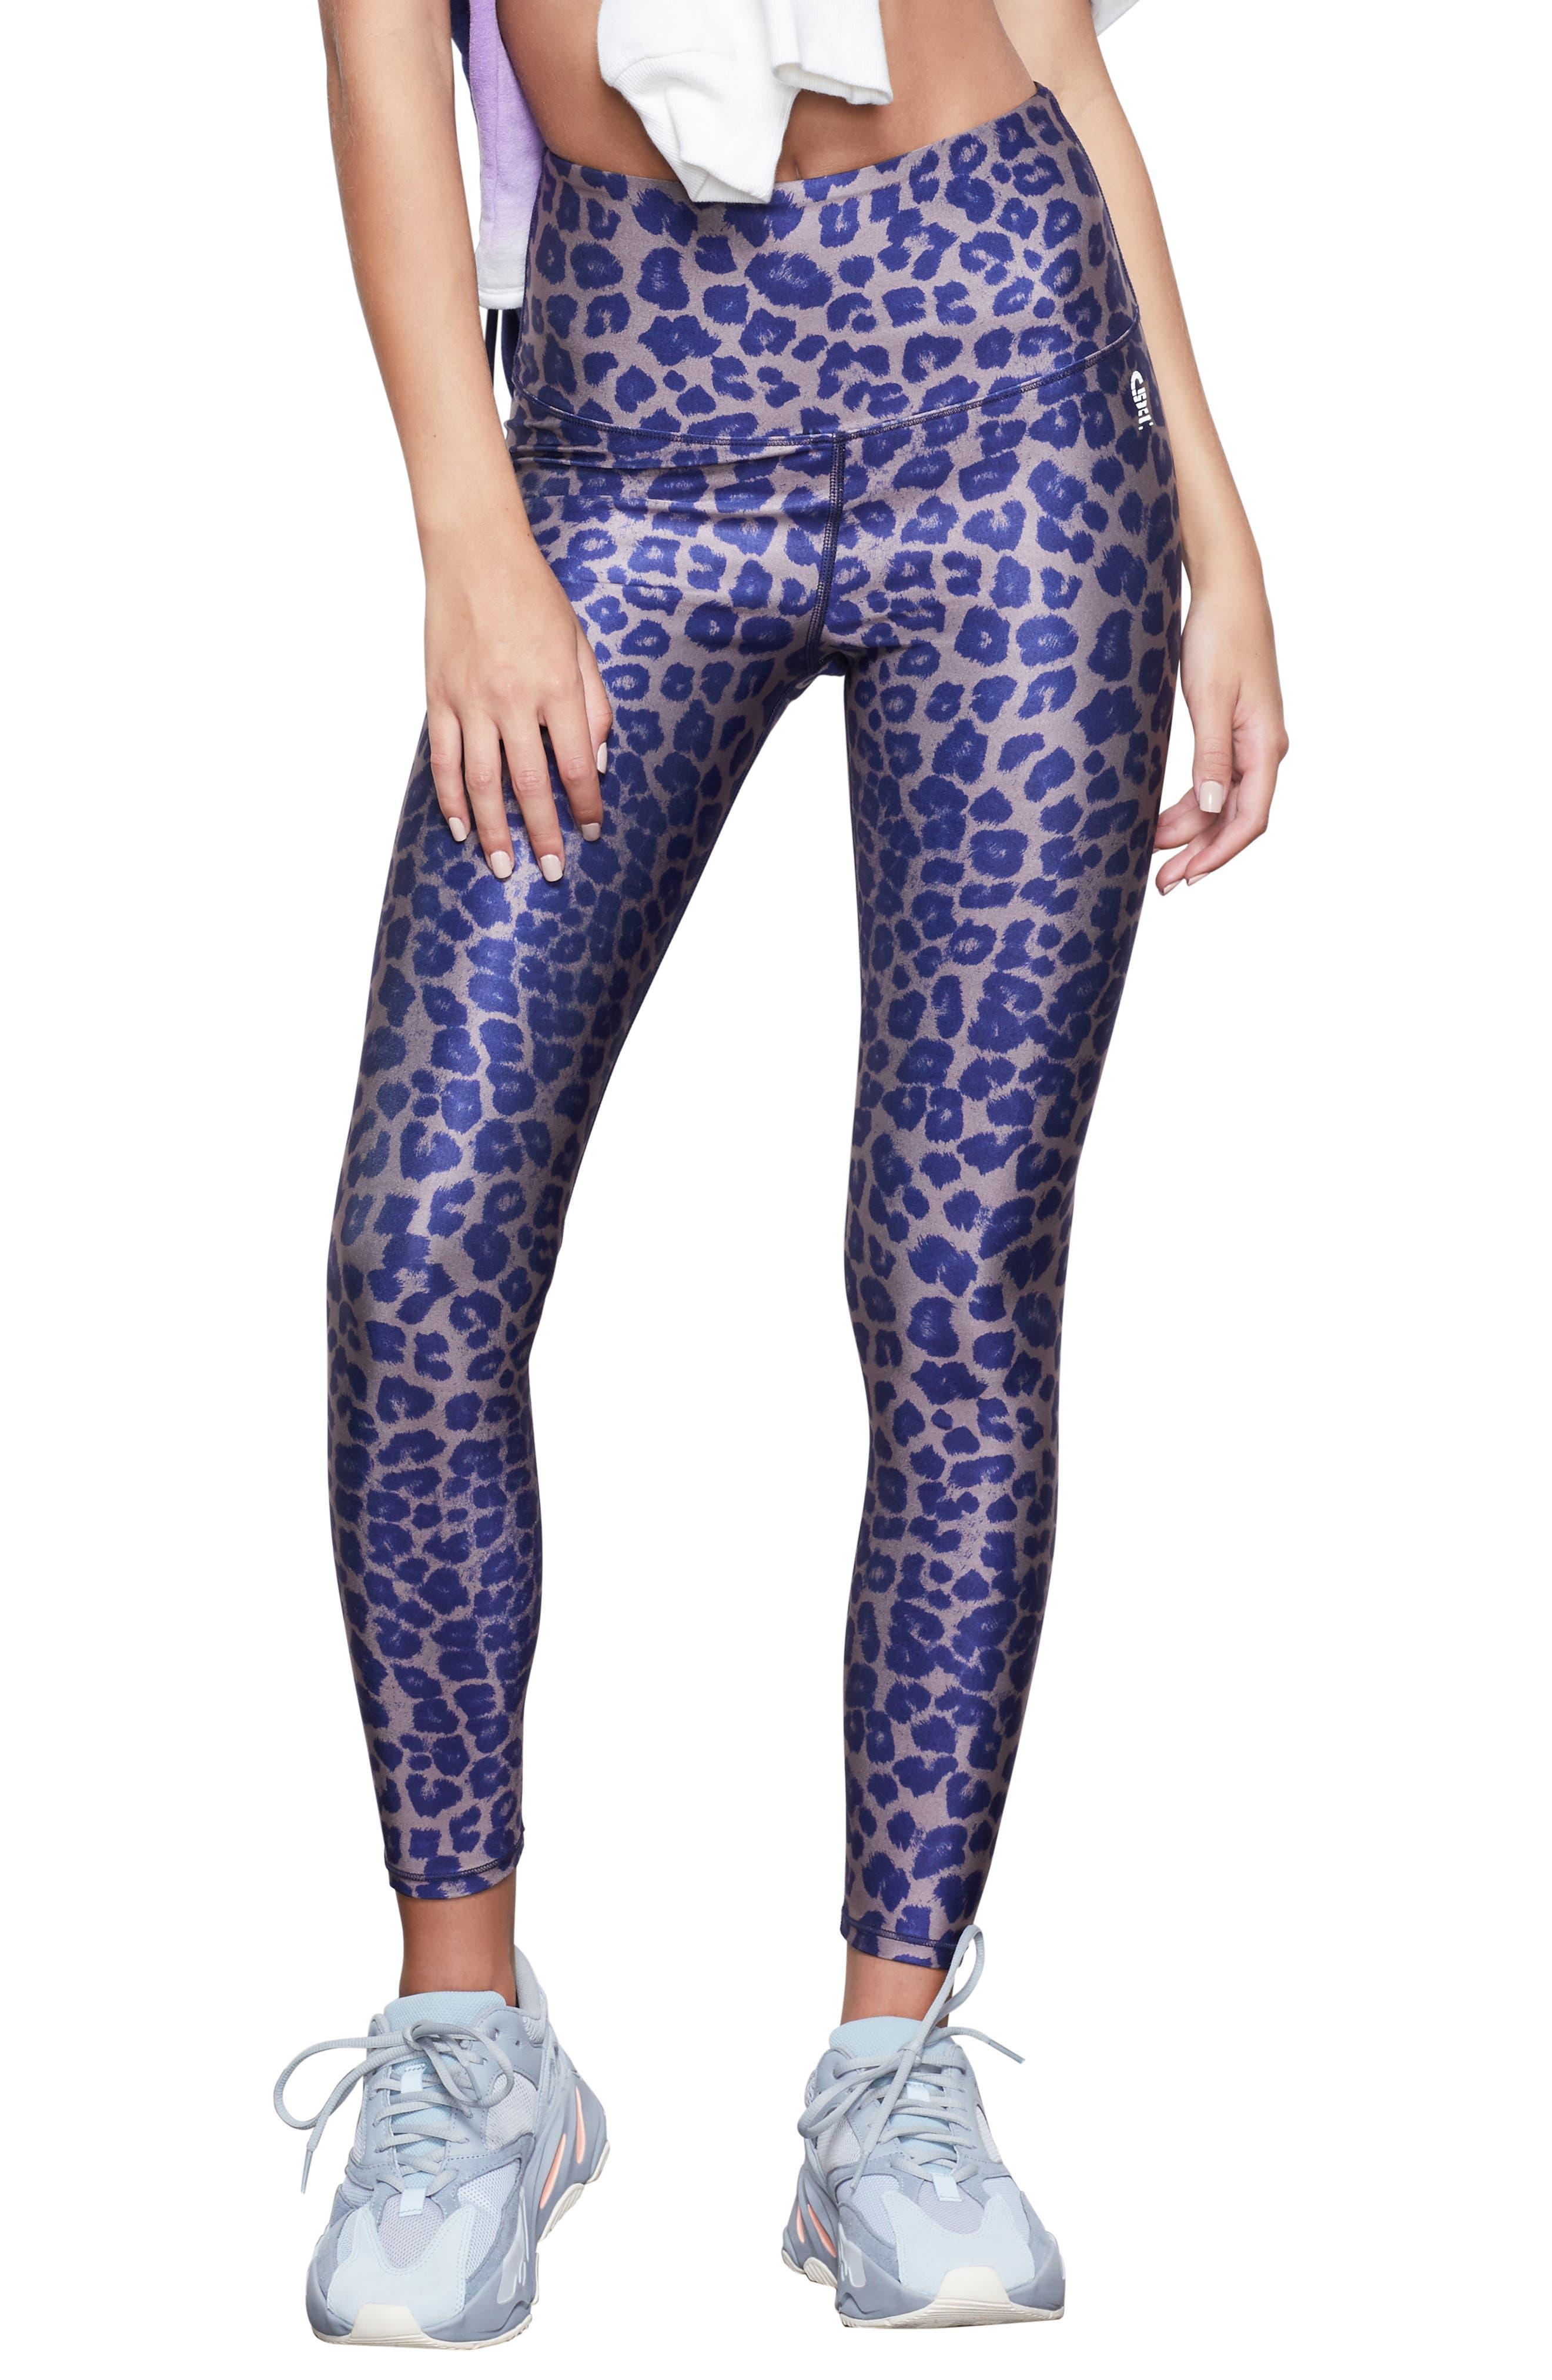 Image of Good American Leopard Print High Waist Leggings